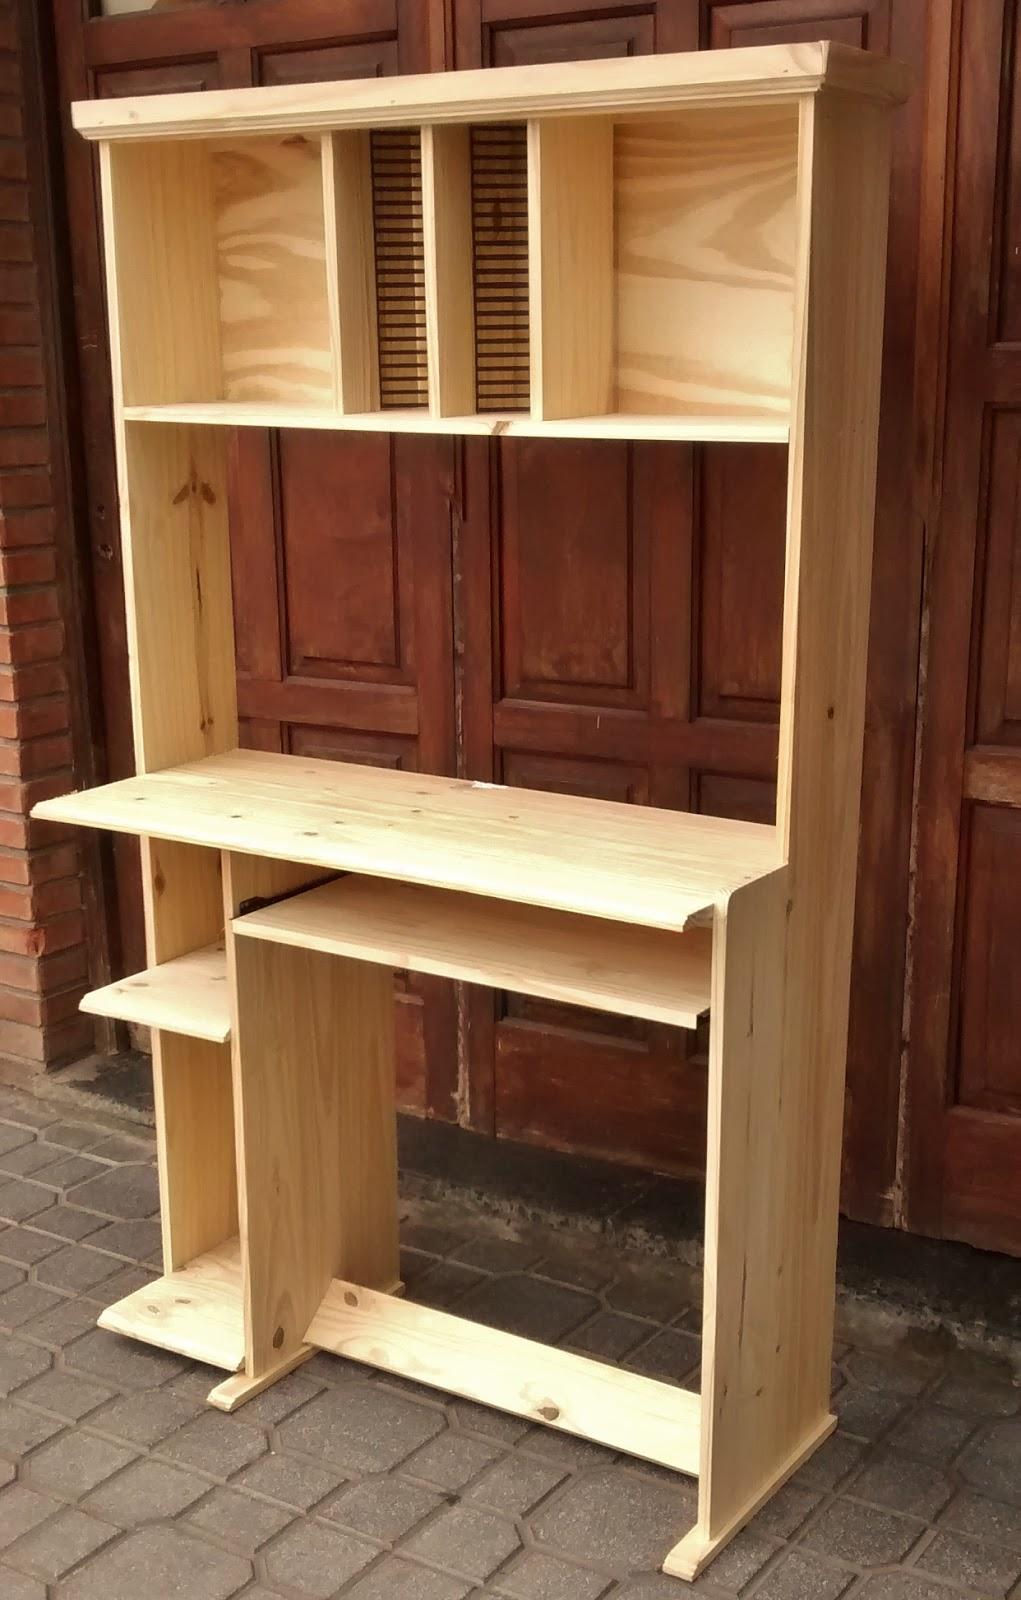 Pichon muebles escritorio de pino doble alzada - Escritorio de pino ...